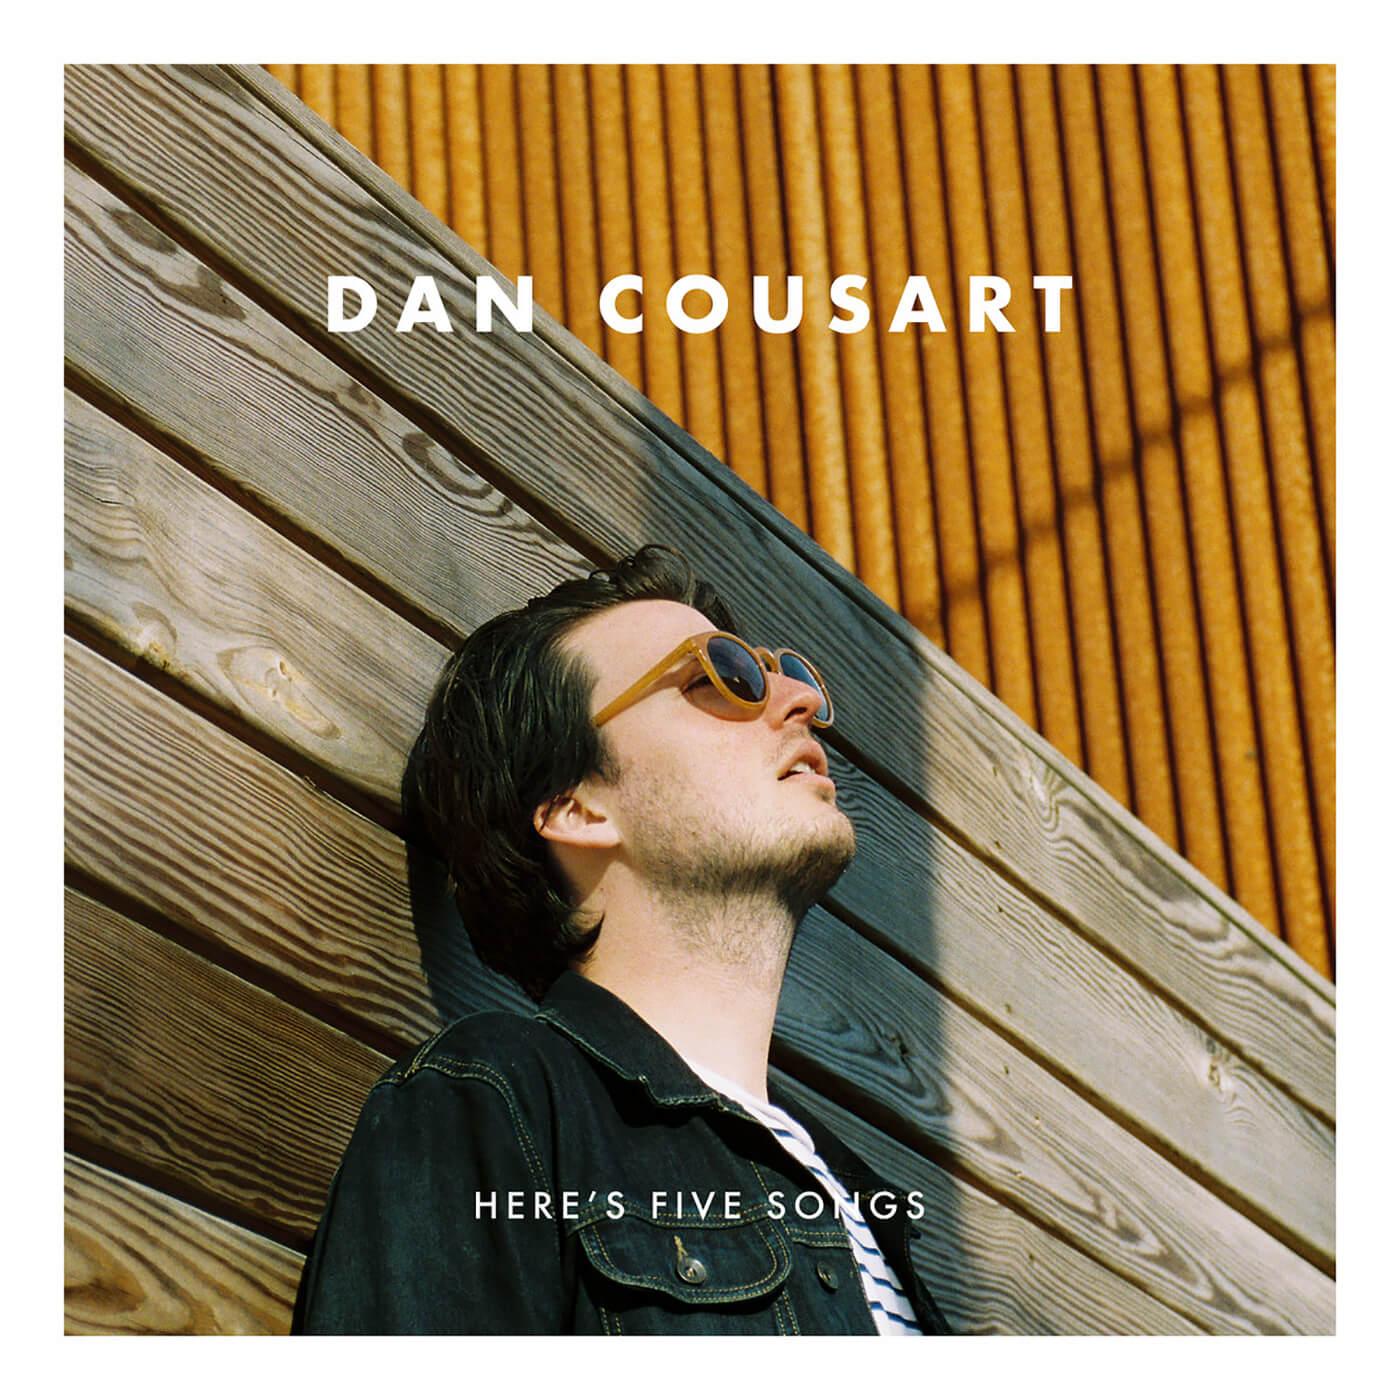 Dan Cousart - Here's Five Songs